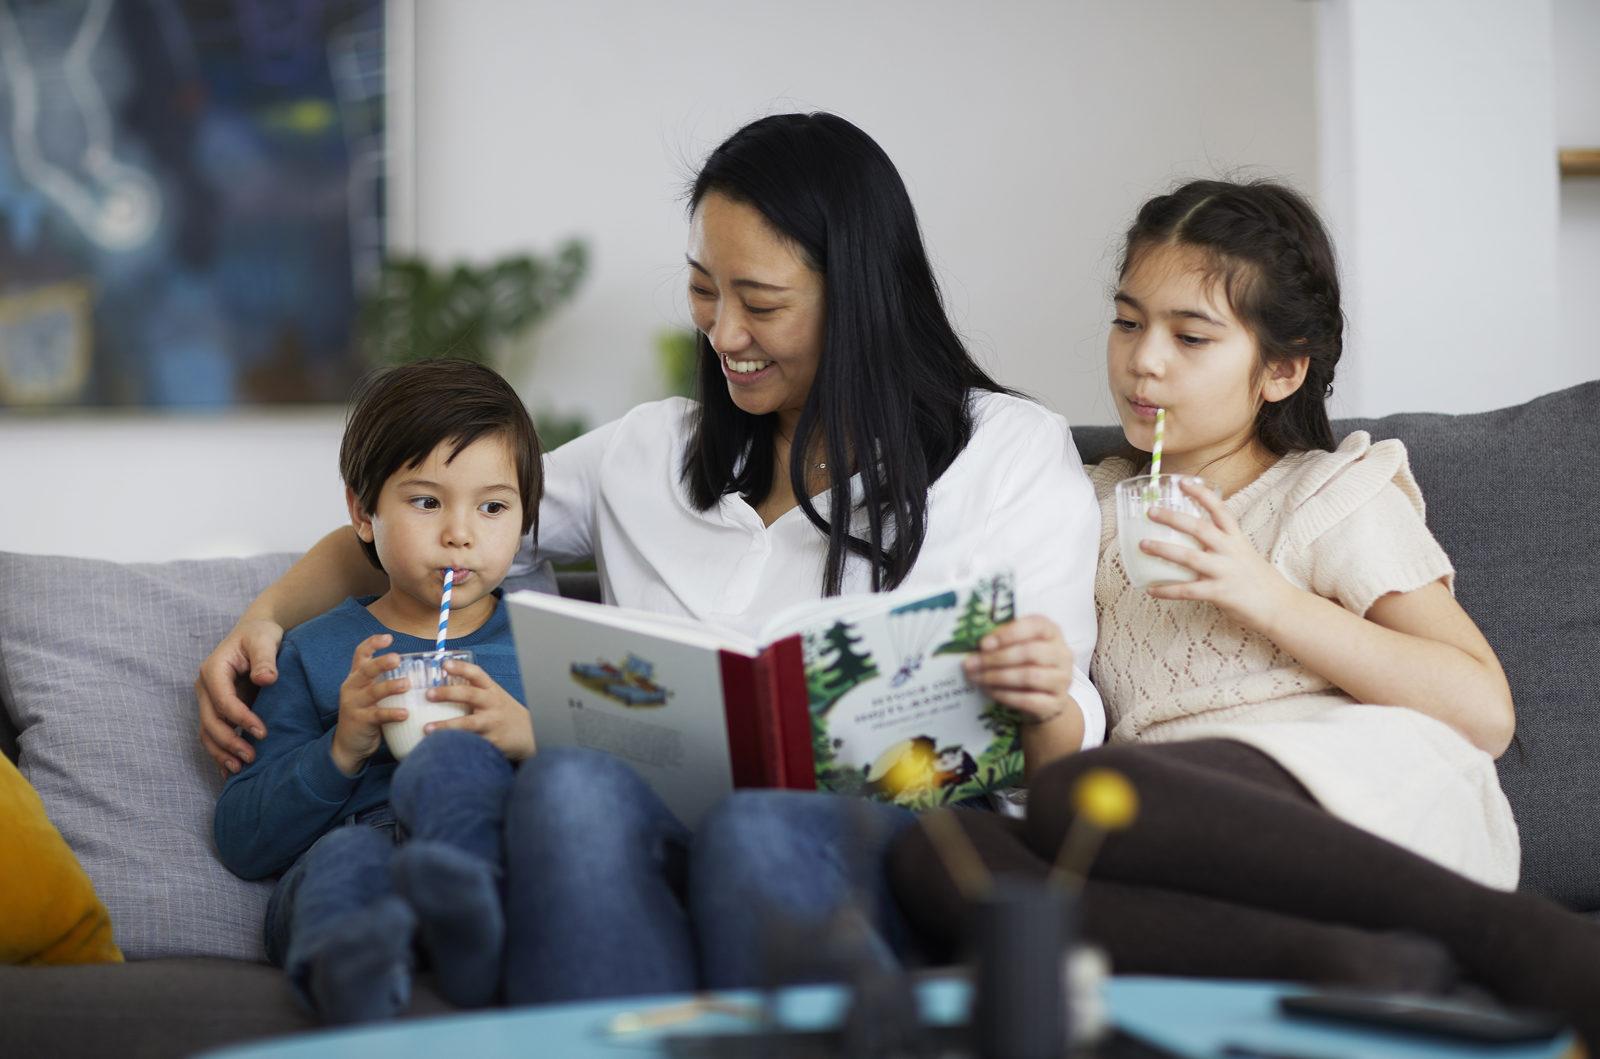 Arla Foods Ingredients develops premium kids' snacks in China